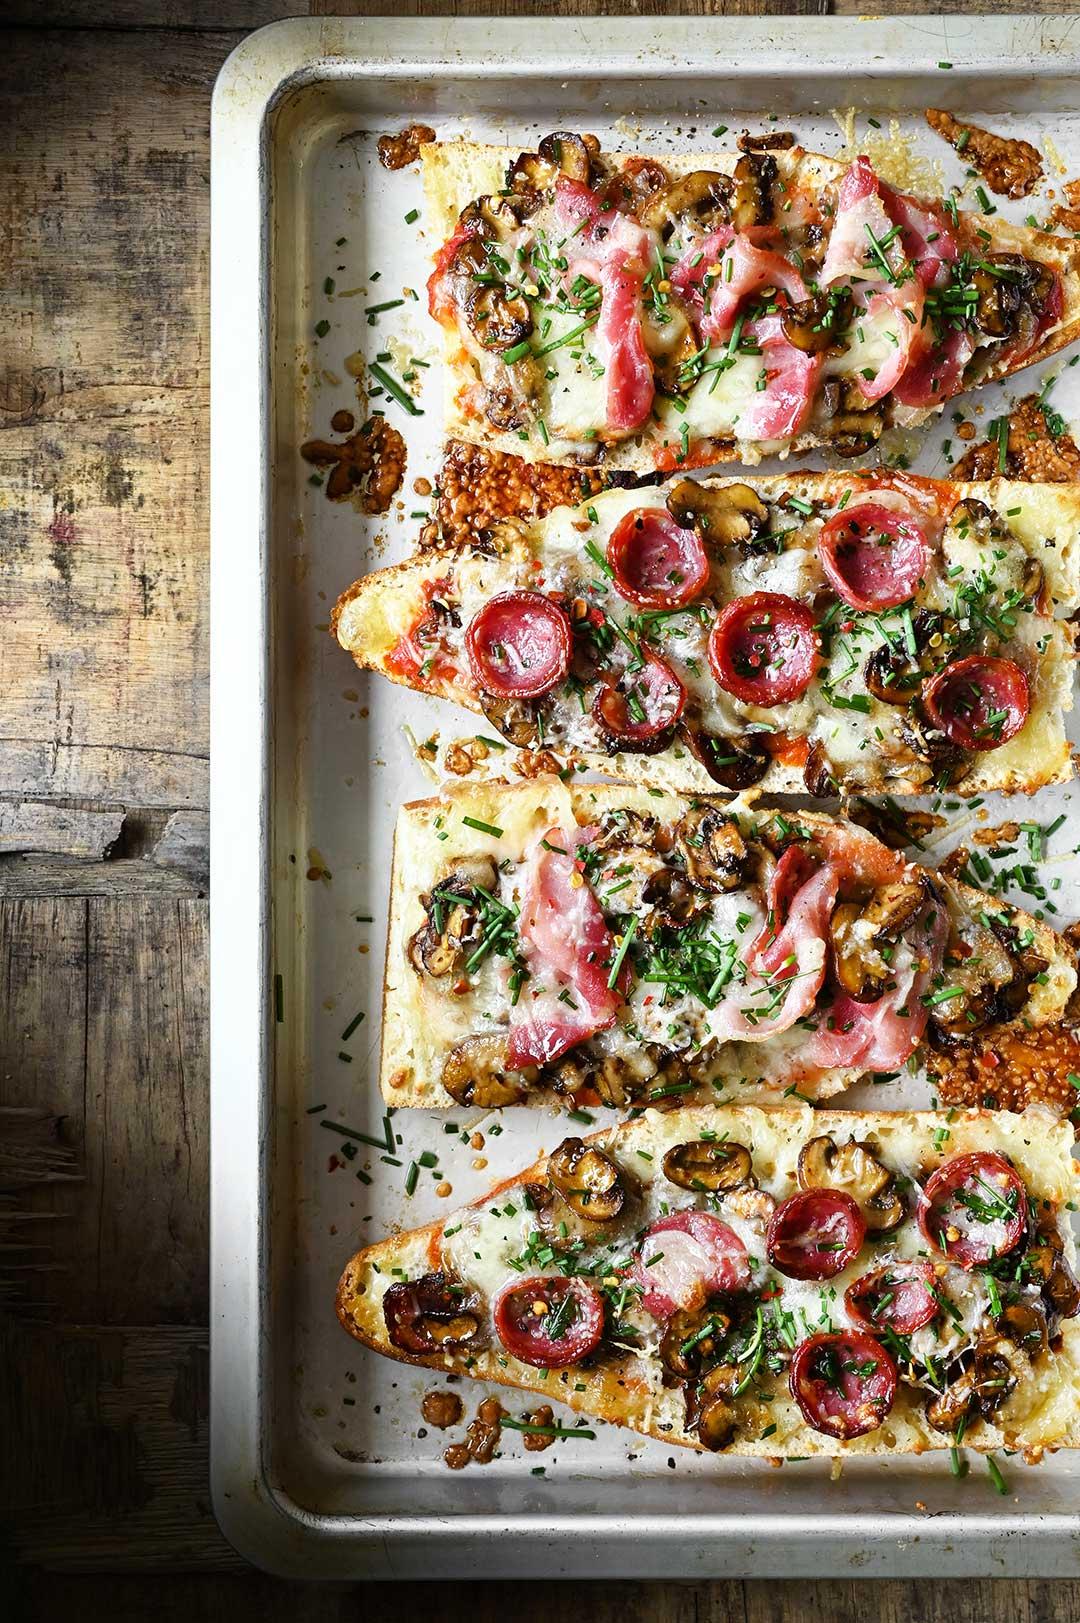 serving dumplings | French Bread Balsamic Mushroom Pizza